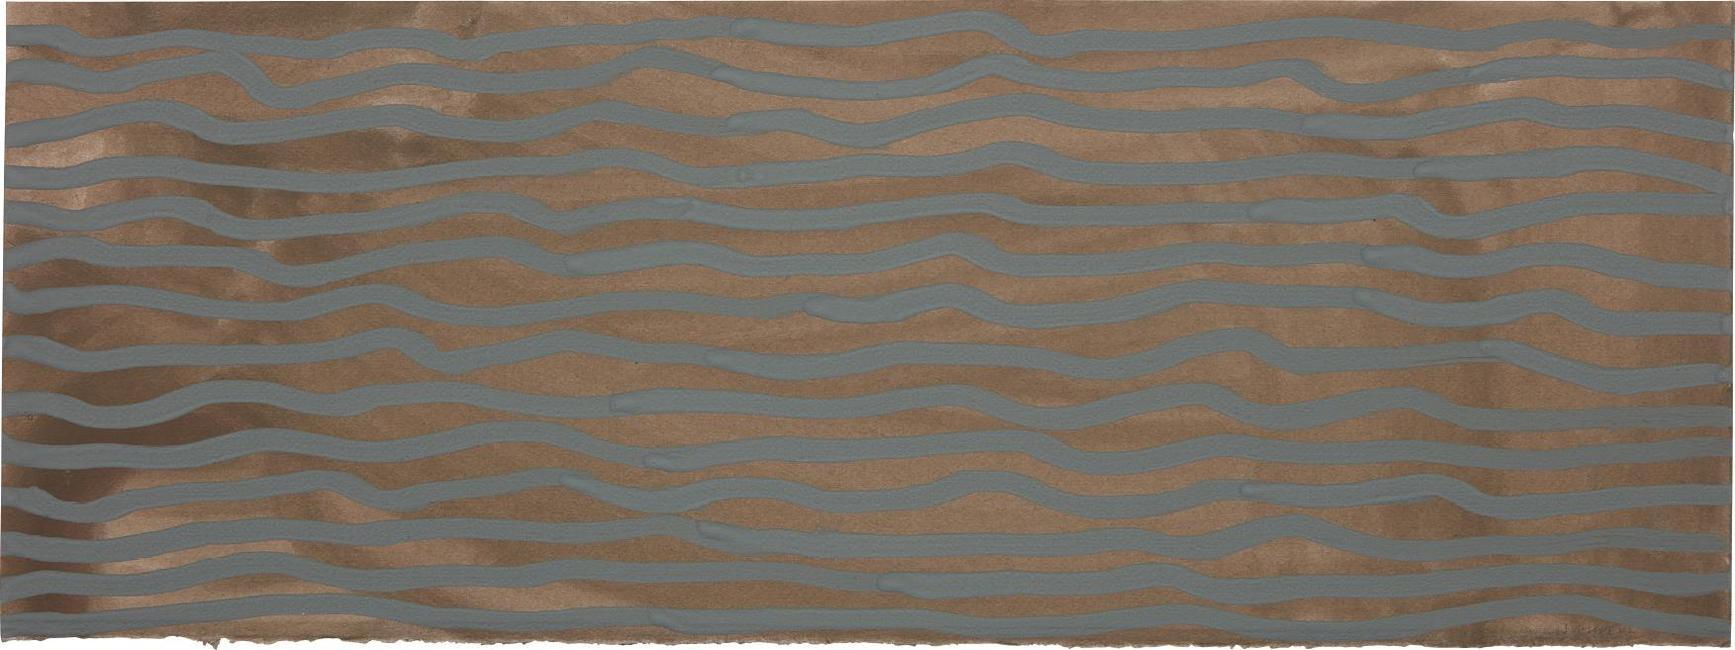 Sol LeWitt-Wavy Brushstrokes (Brown And Blue)-2002